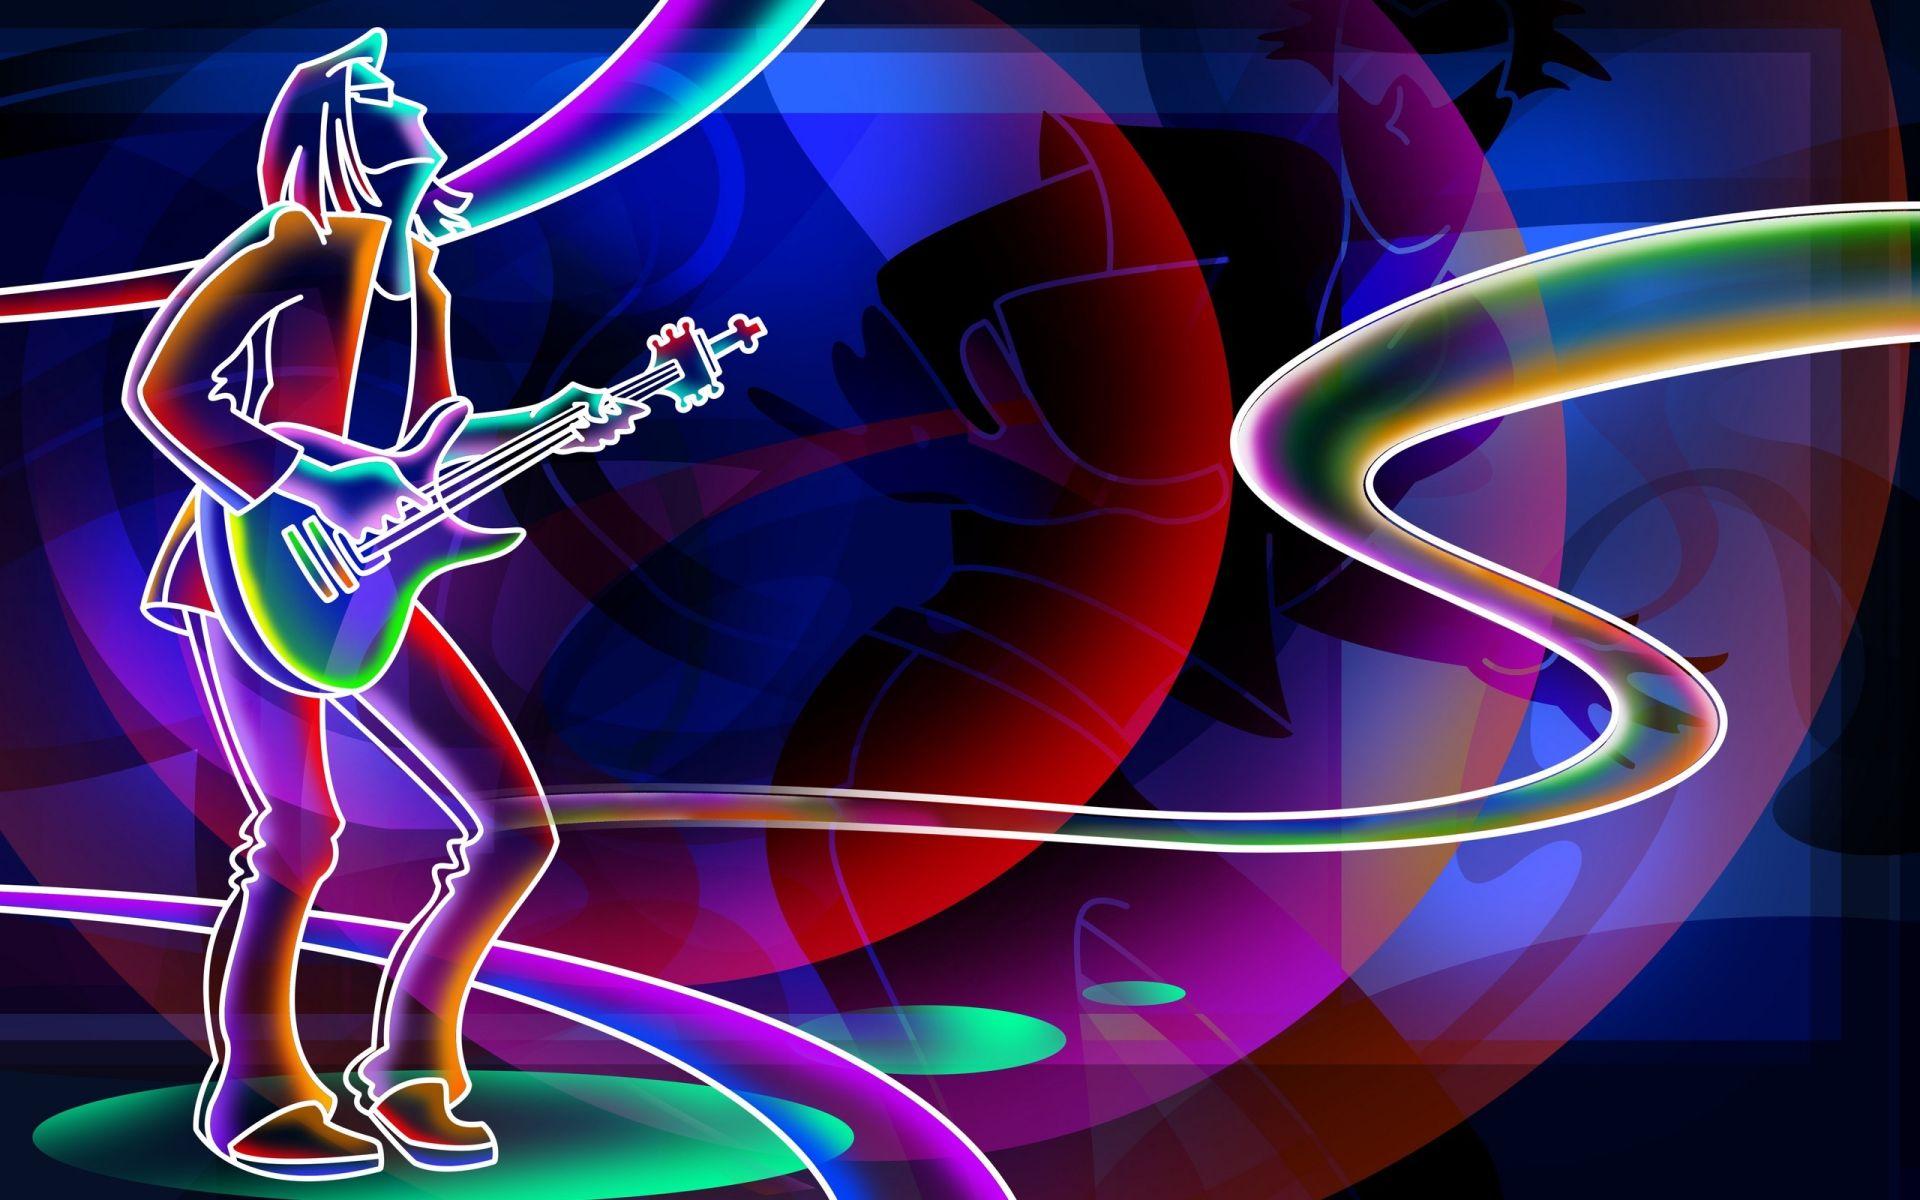 Guitar Abstract, PC Wallpaper HD